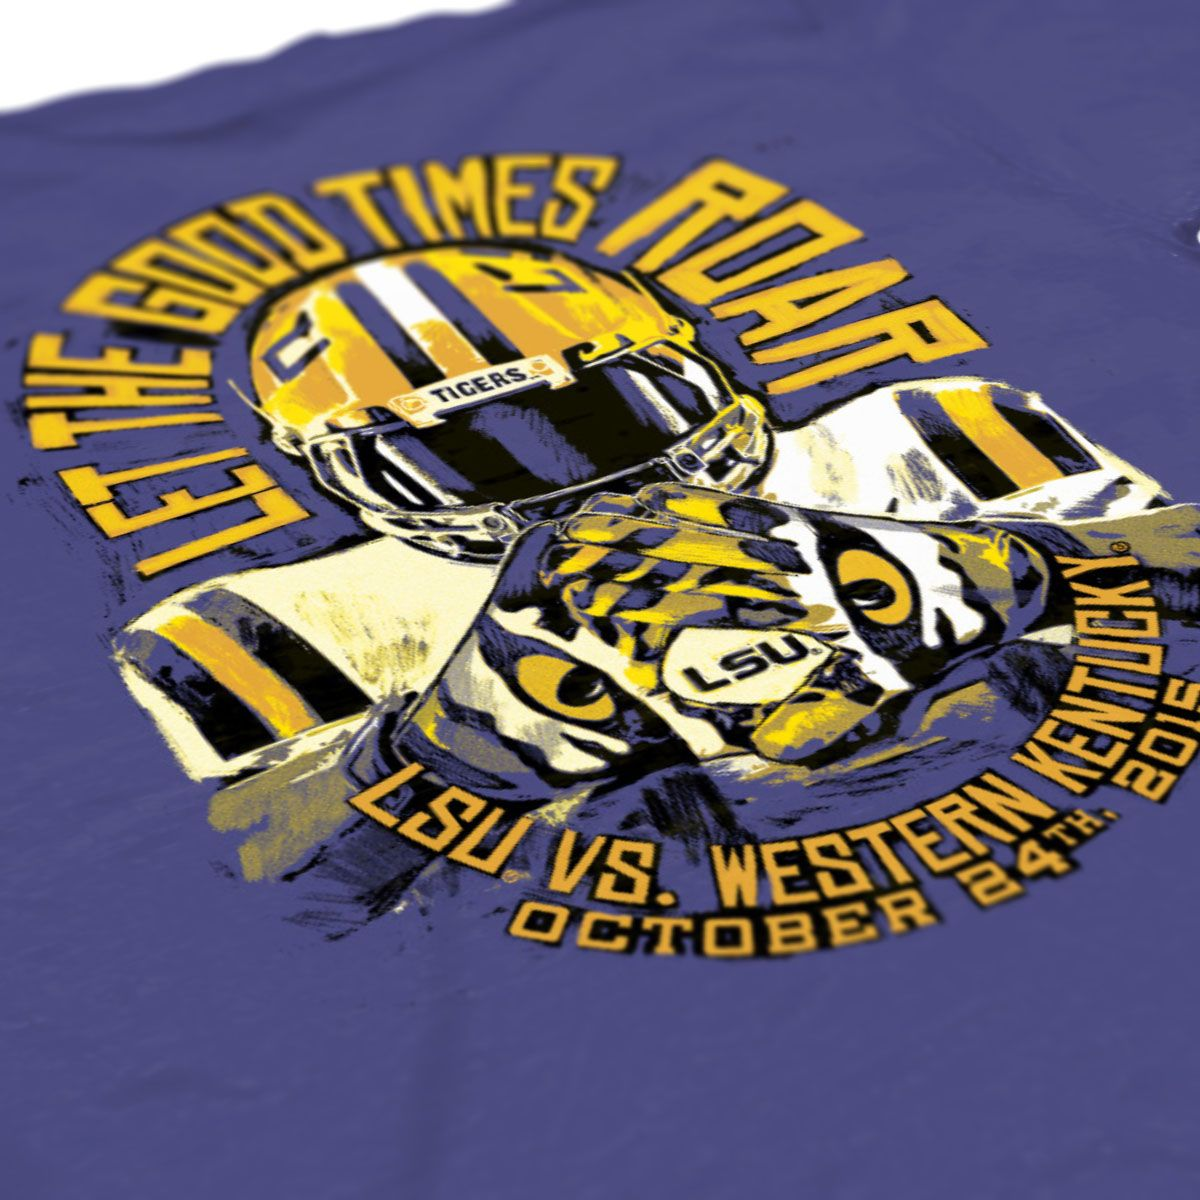 Shirt design for alumni homecoming - Football Shirts